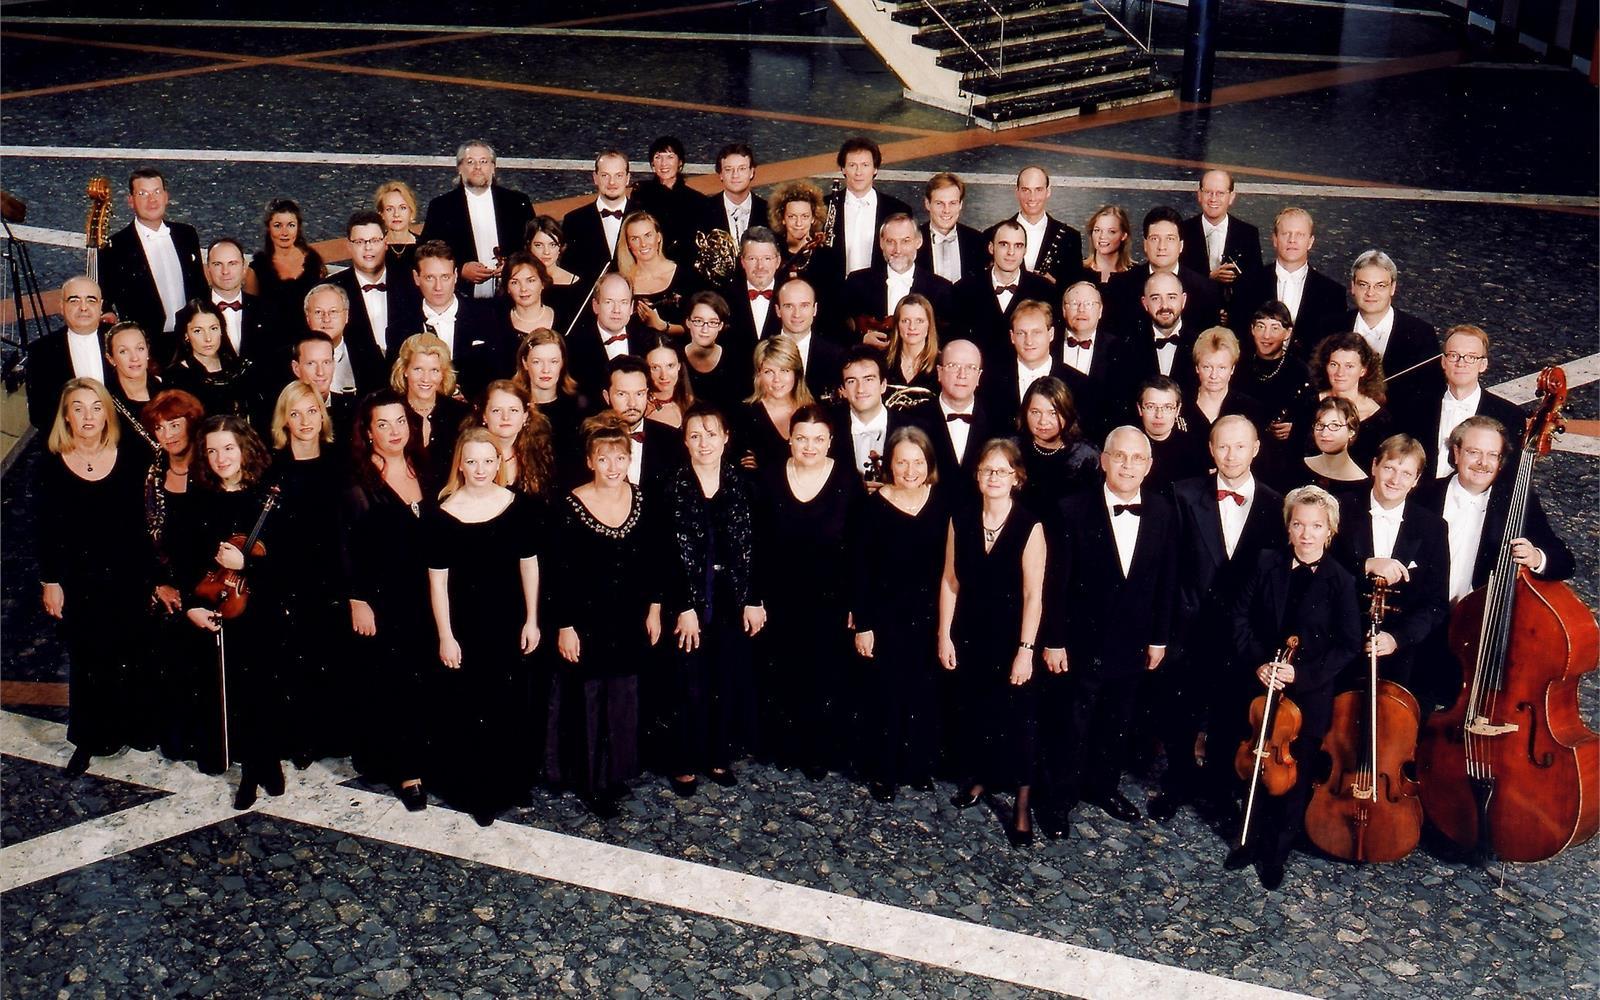 d979b2efa78 Internationale Bachakademie Stuttgart (H.C. Rademann) - Lorenzo Baldrighi  Artists Management